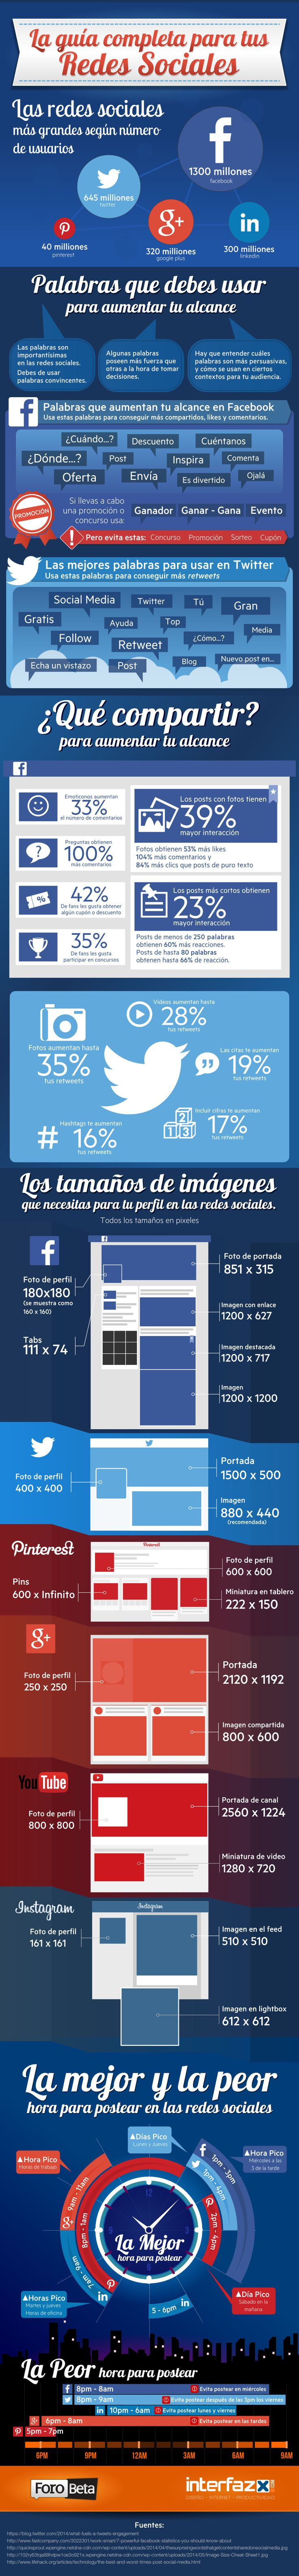 Guía completa para tus Redes Sociales #infografia